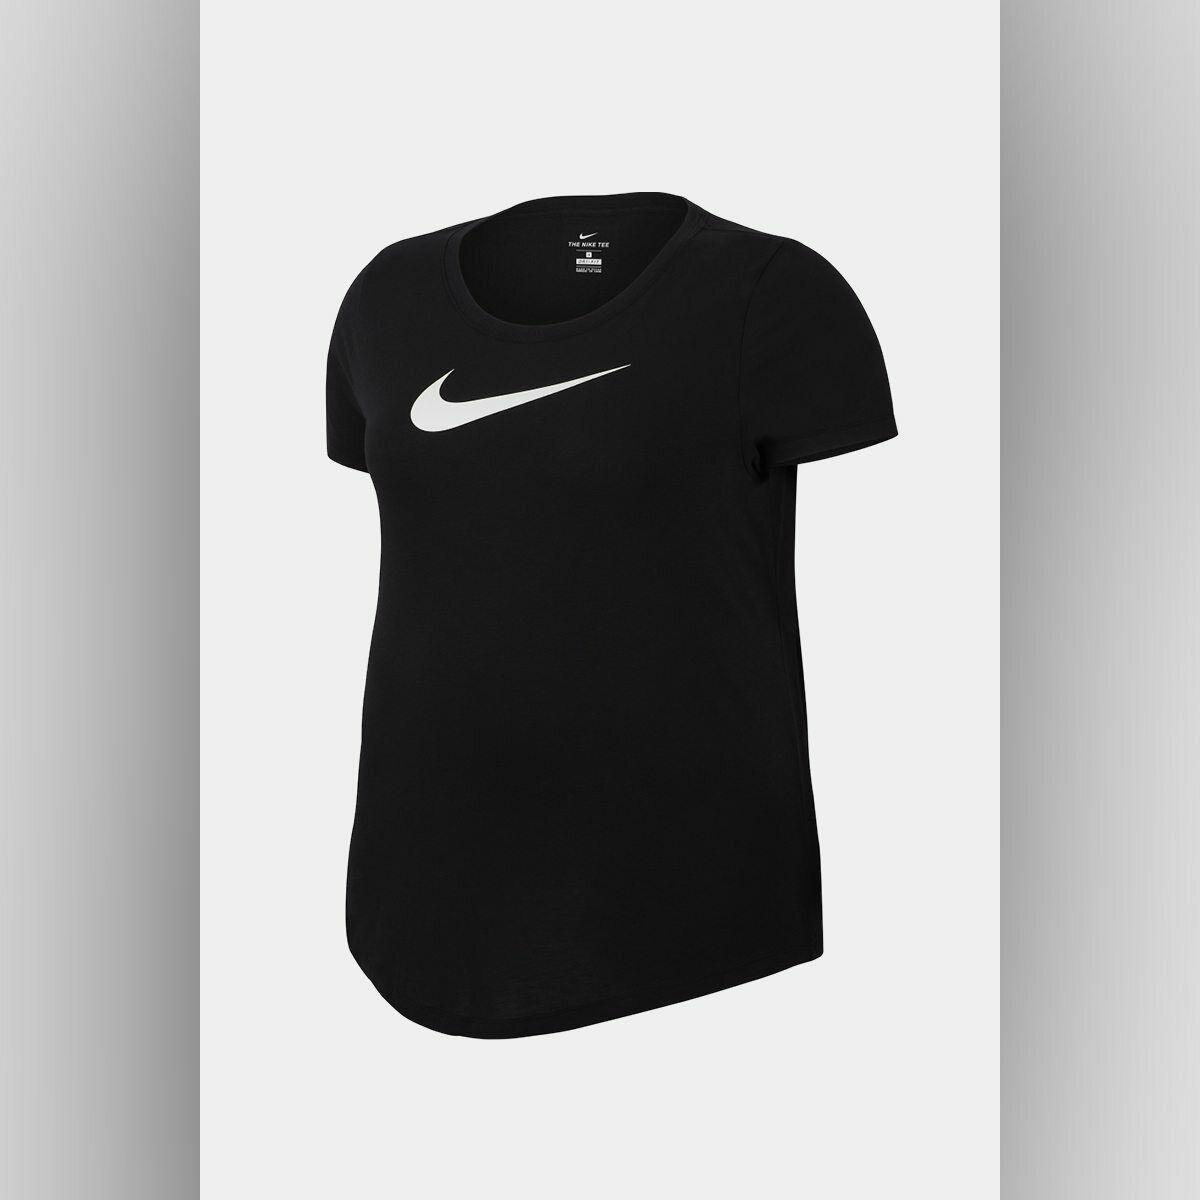 Nike Womens Athletic Running T-shirt